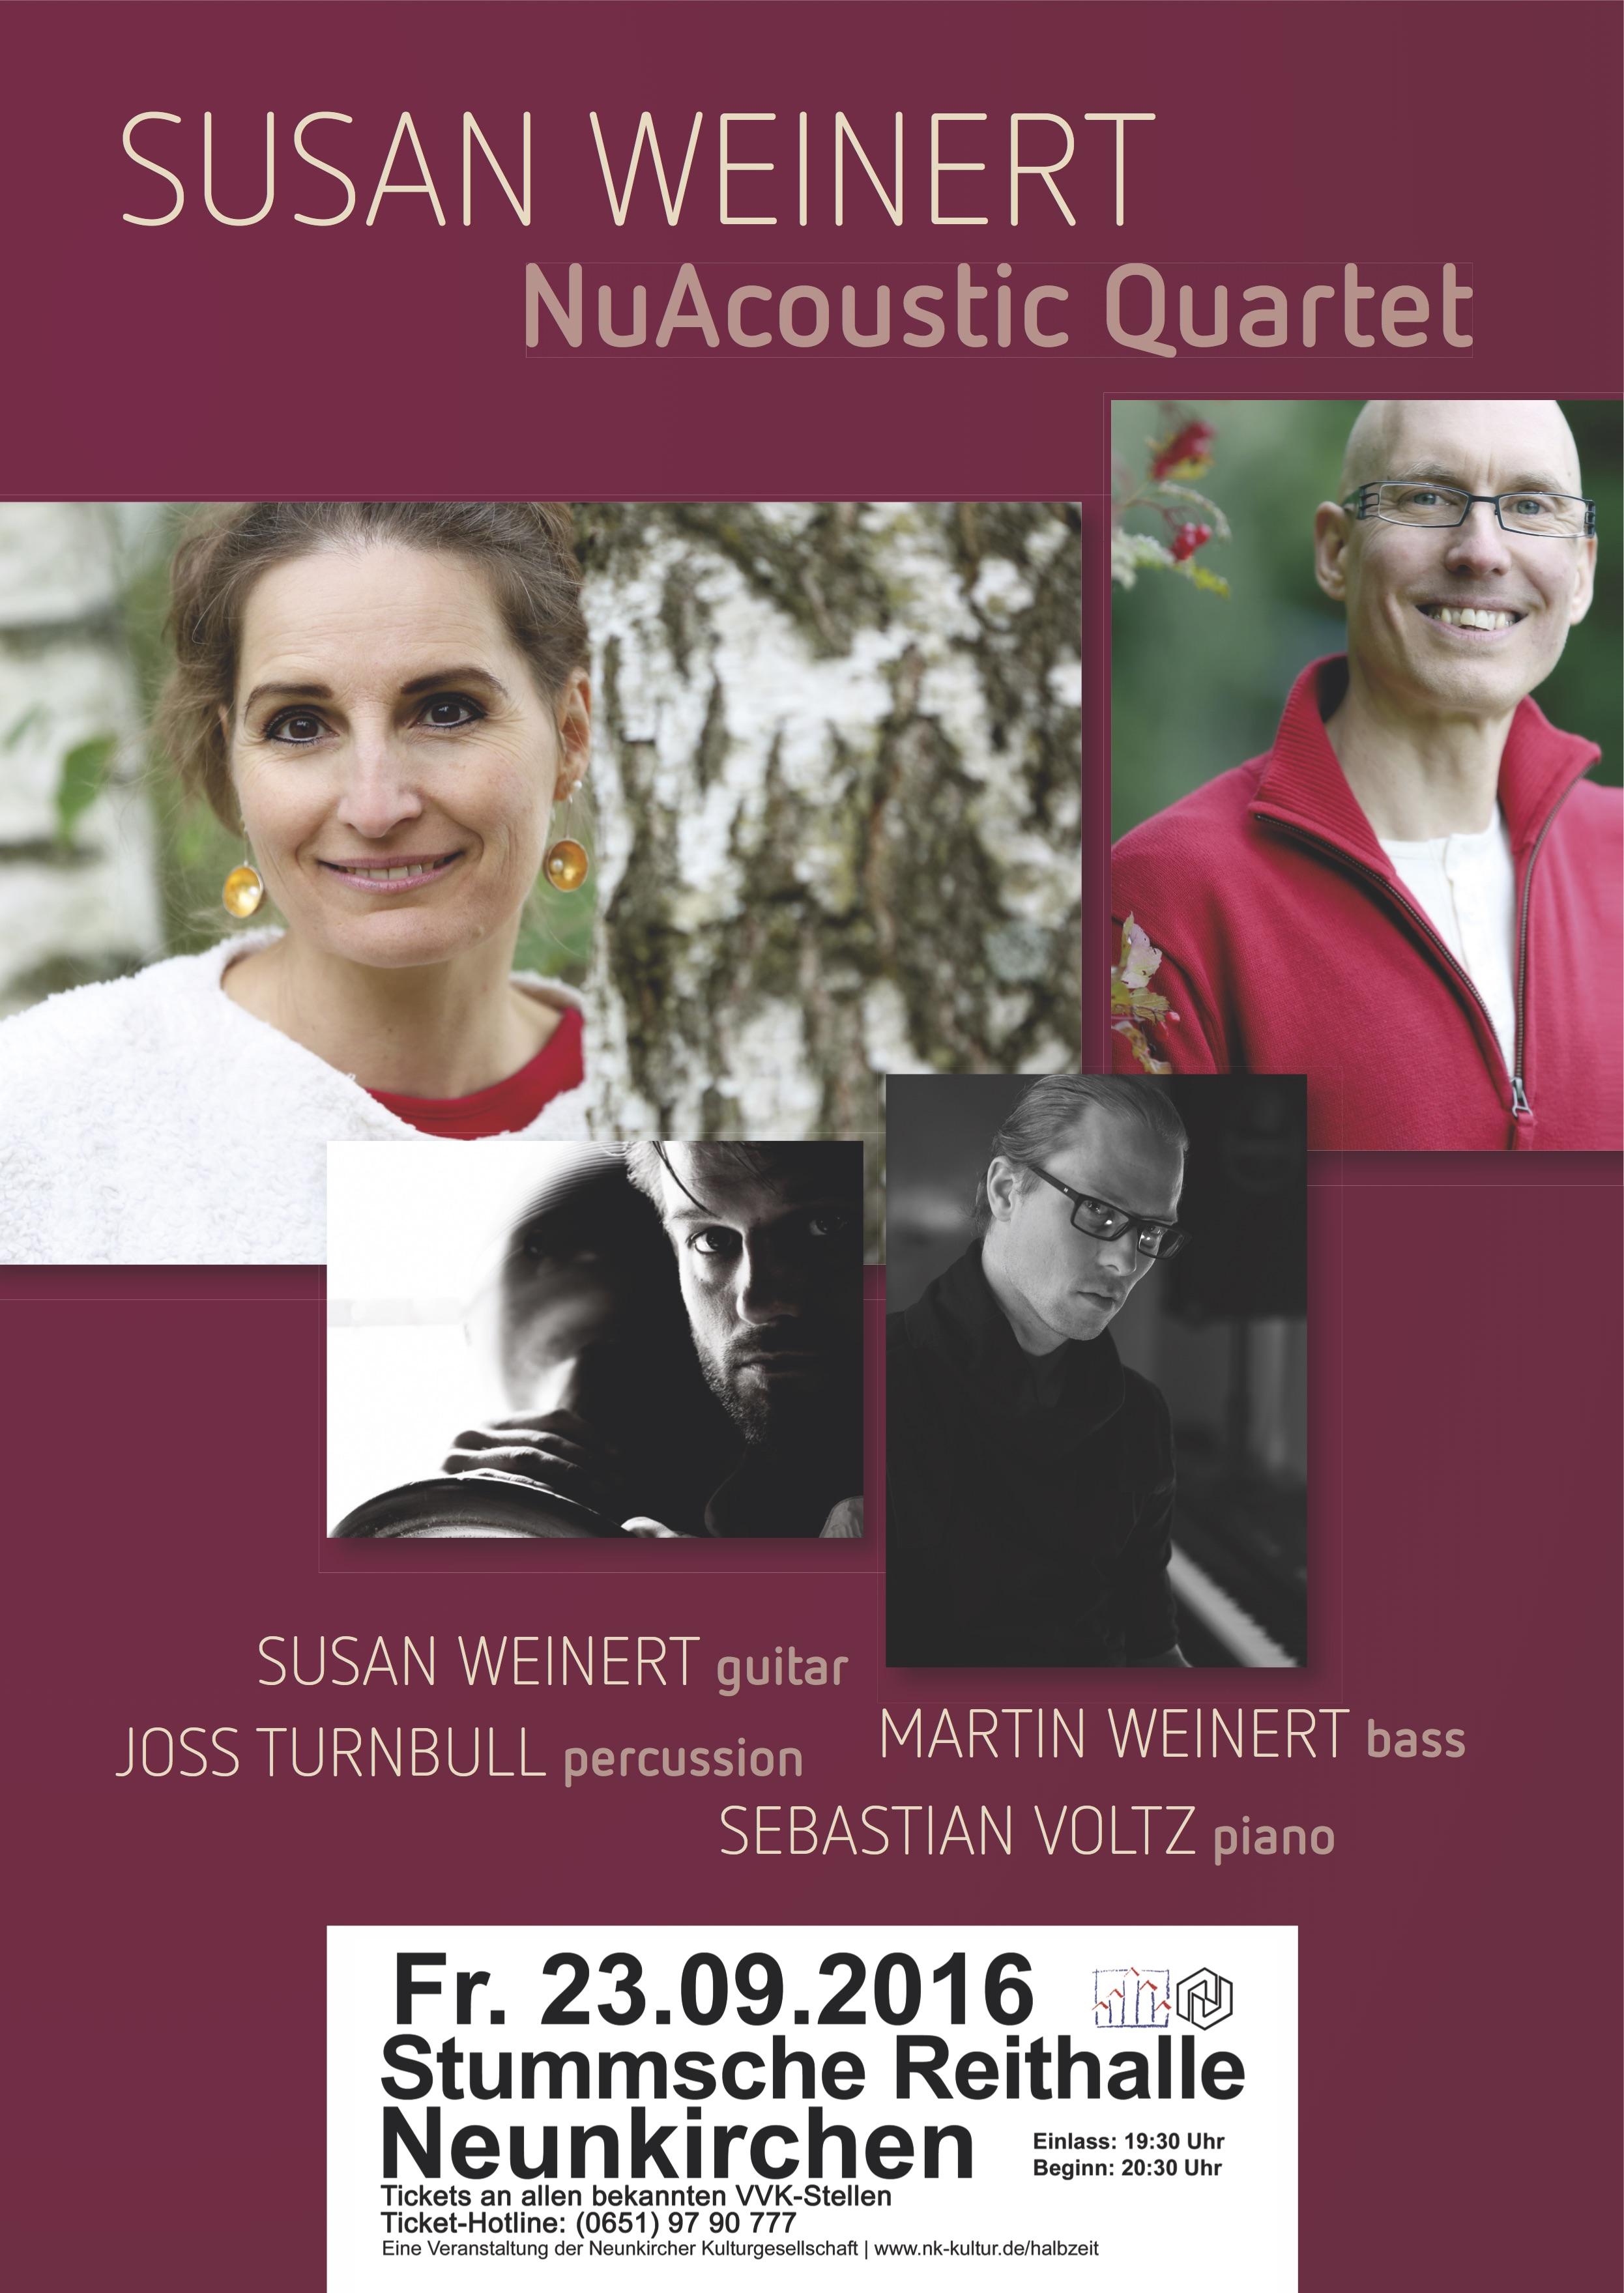 susanweinert-nu-acoustic-4tet